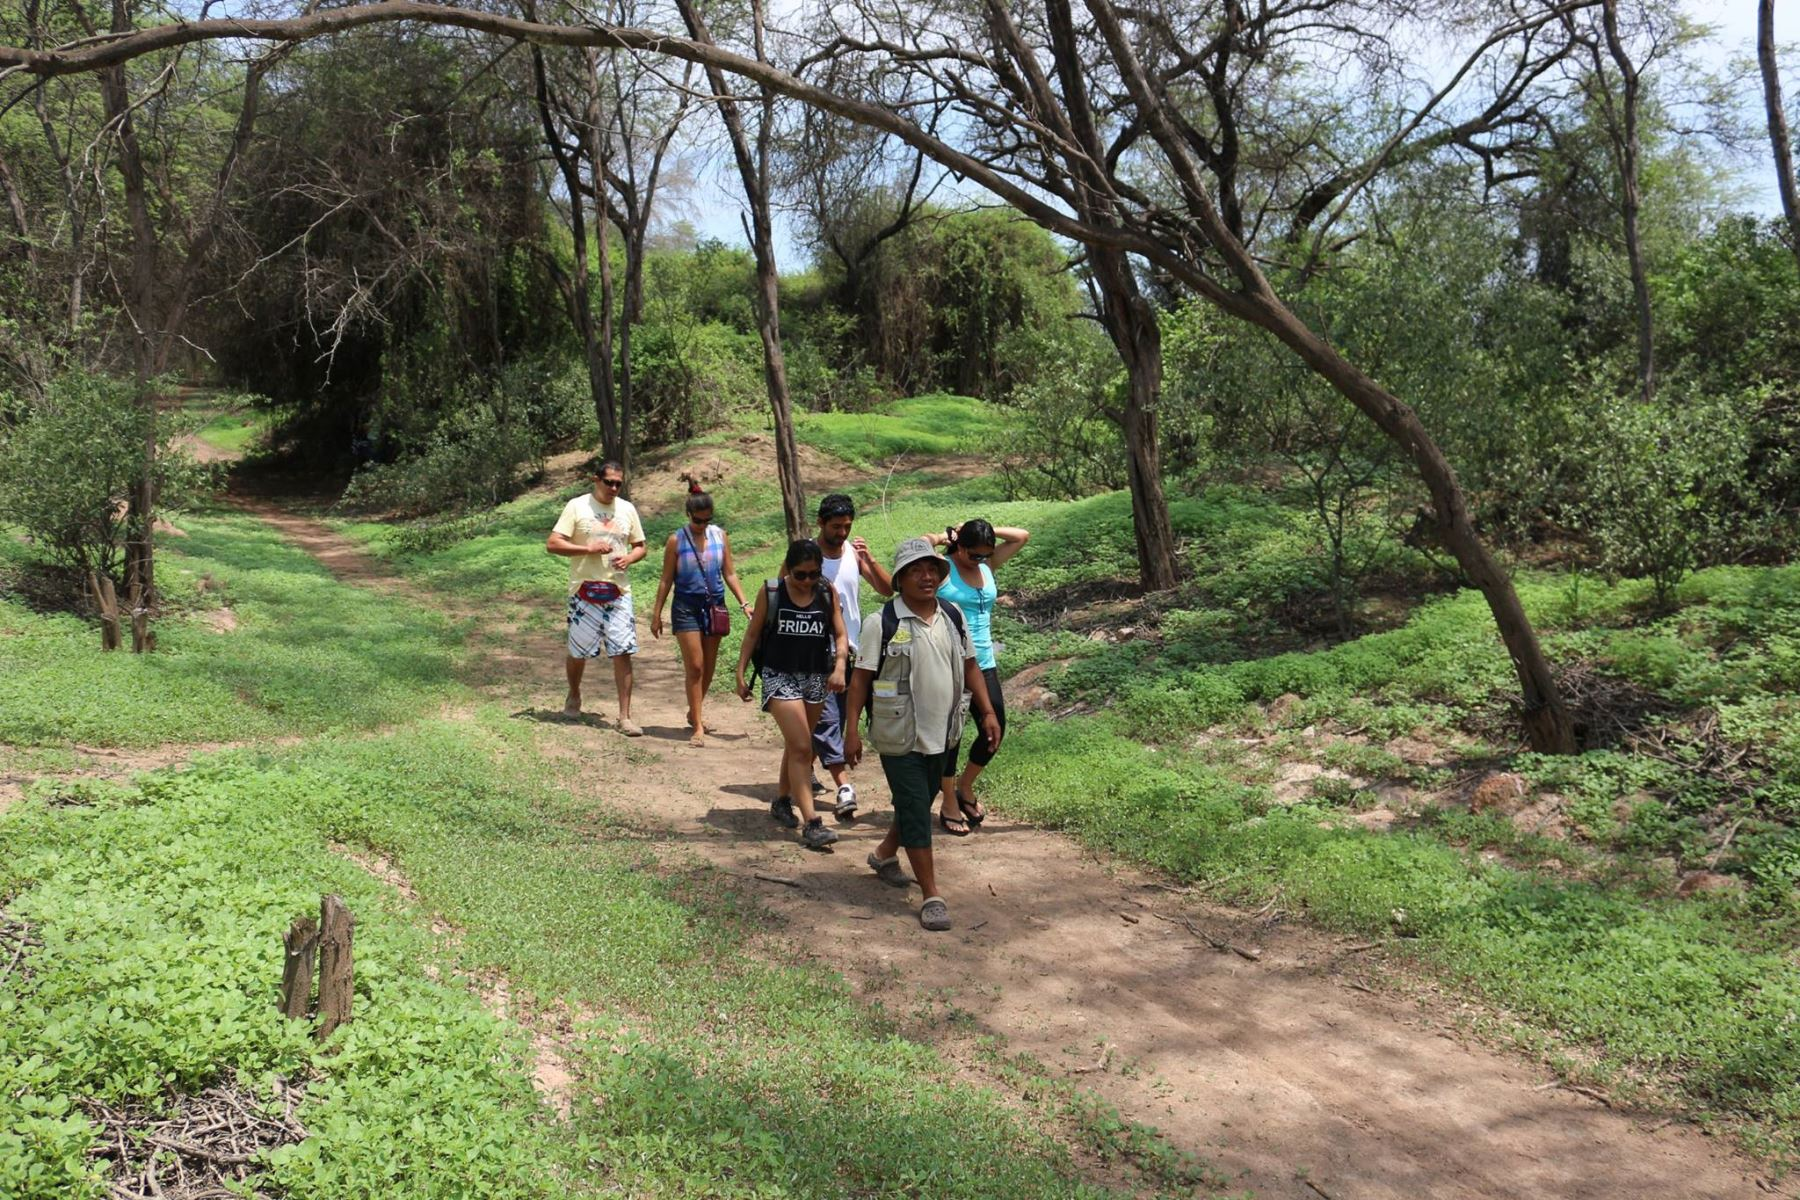 Santuario Histórico Bosque de Pómac. INTERNET/Medios